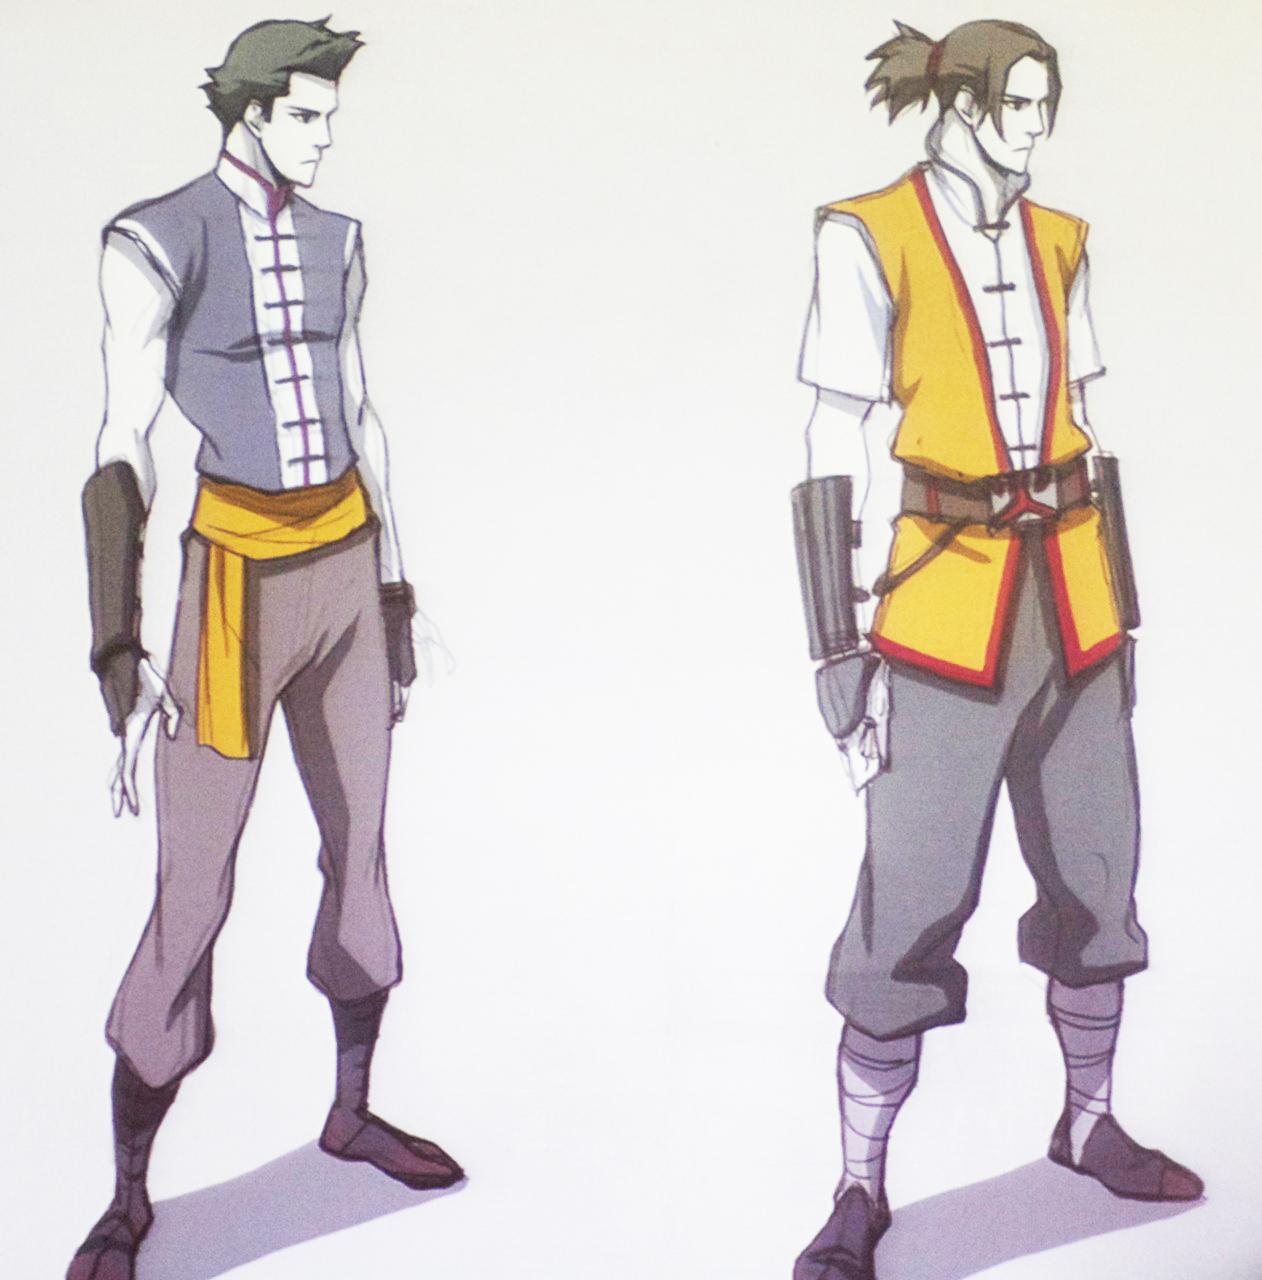 Avatar the legend of korra mako original concept